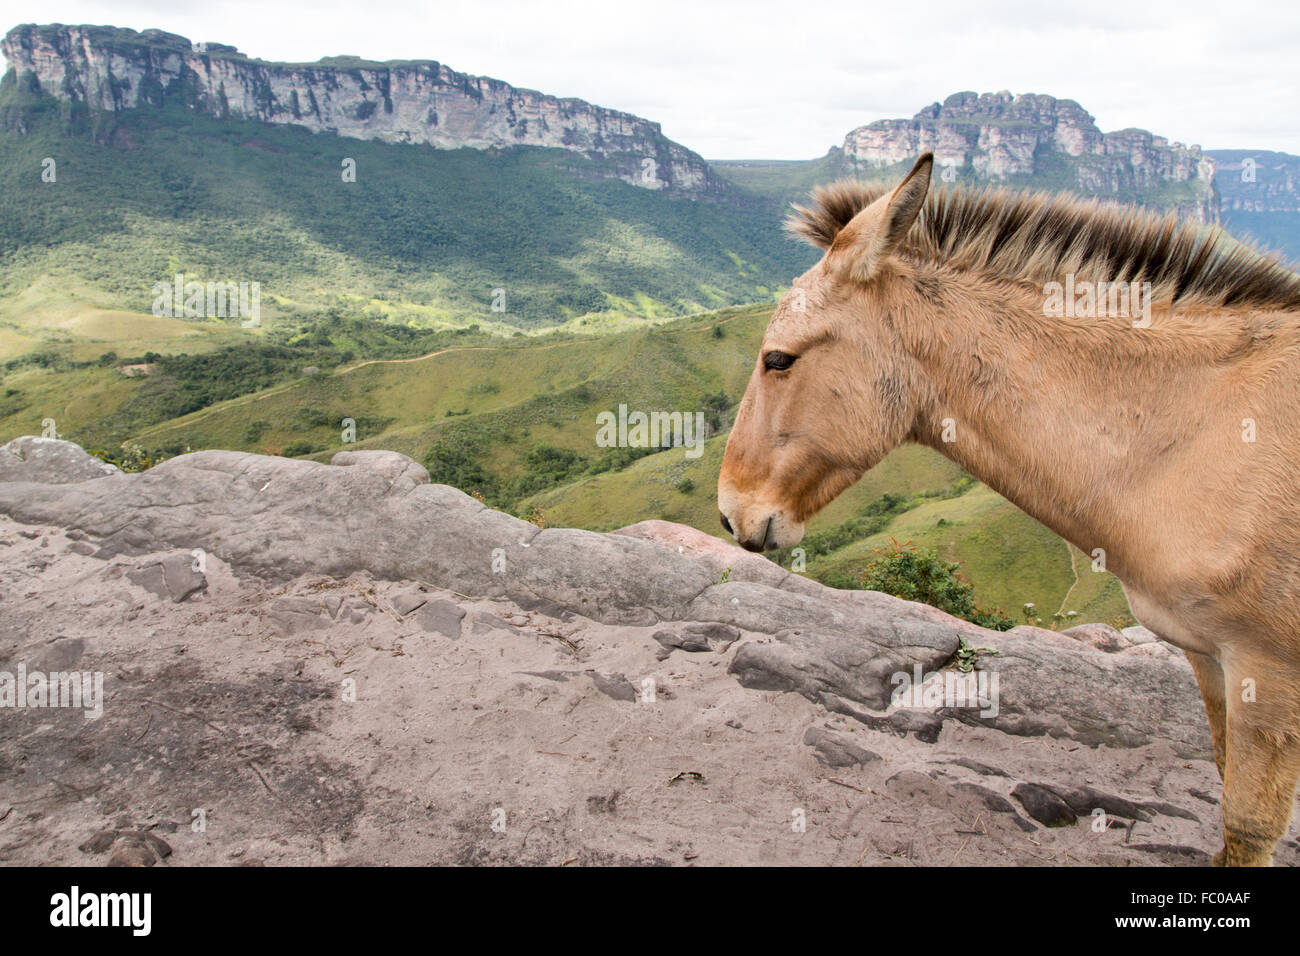 Chapada Diamantina National Parc/Vale do Pati - Stock Image